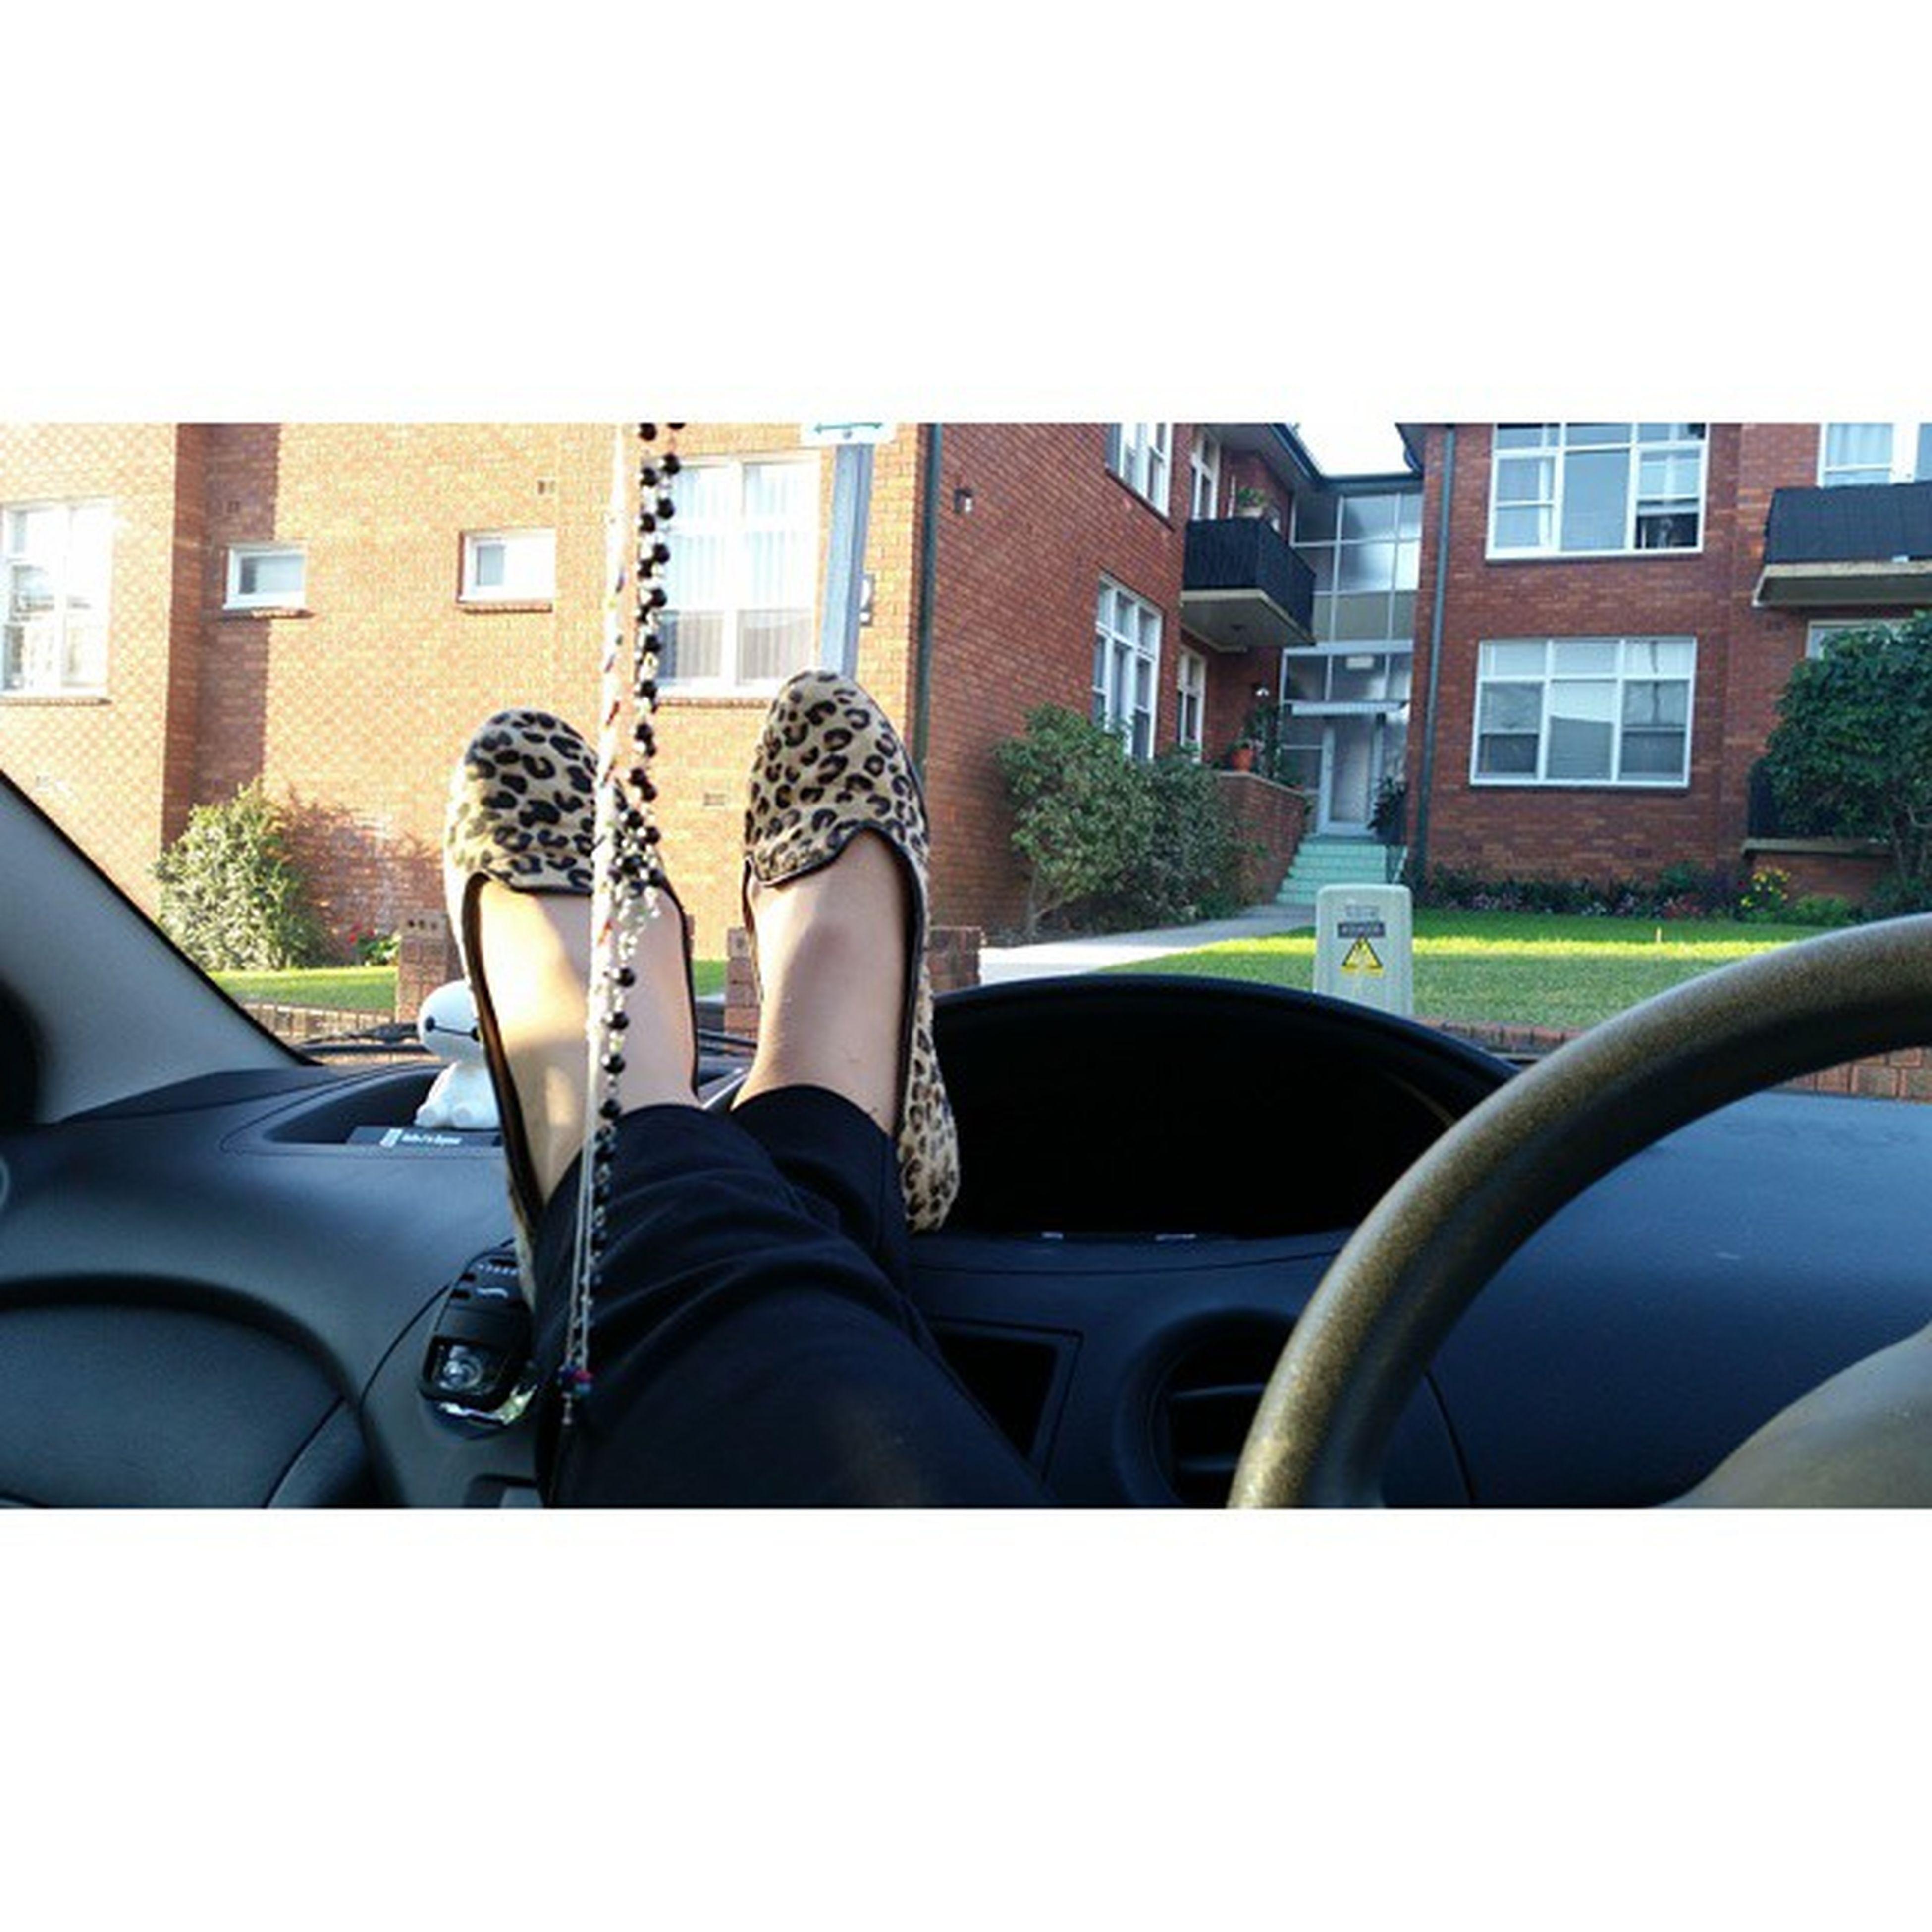 Just waiting for a mate @simoneee___ 😍 Amforcedtodowork Shouldcomemoreoften Amsoexcited Baymaxiskeepingmecompany 😊